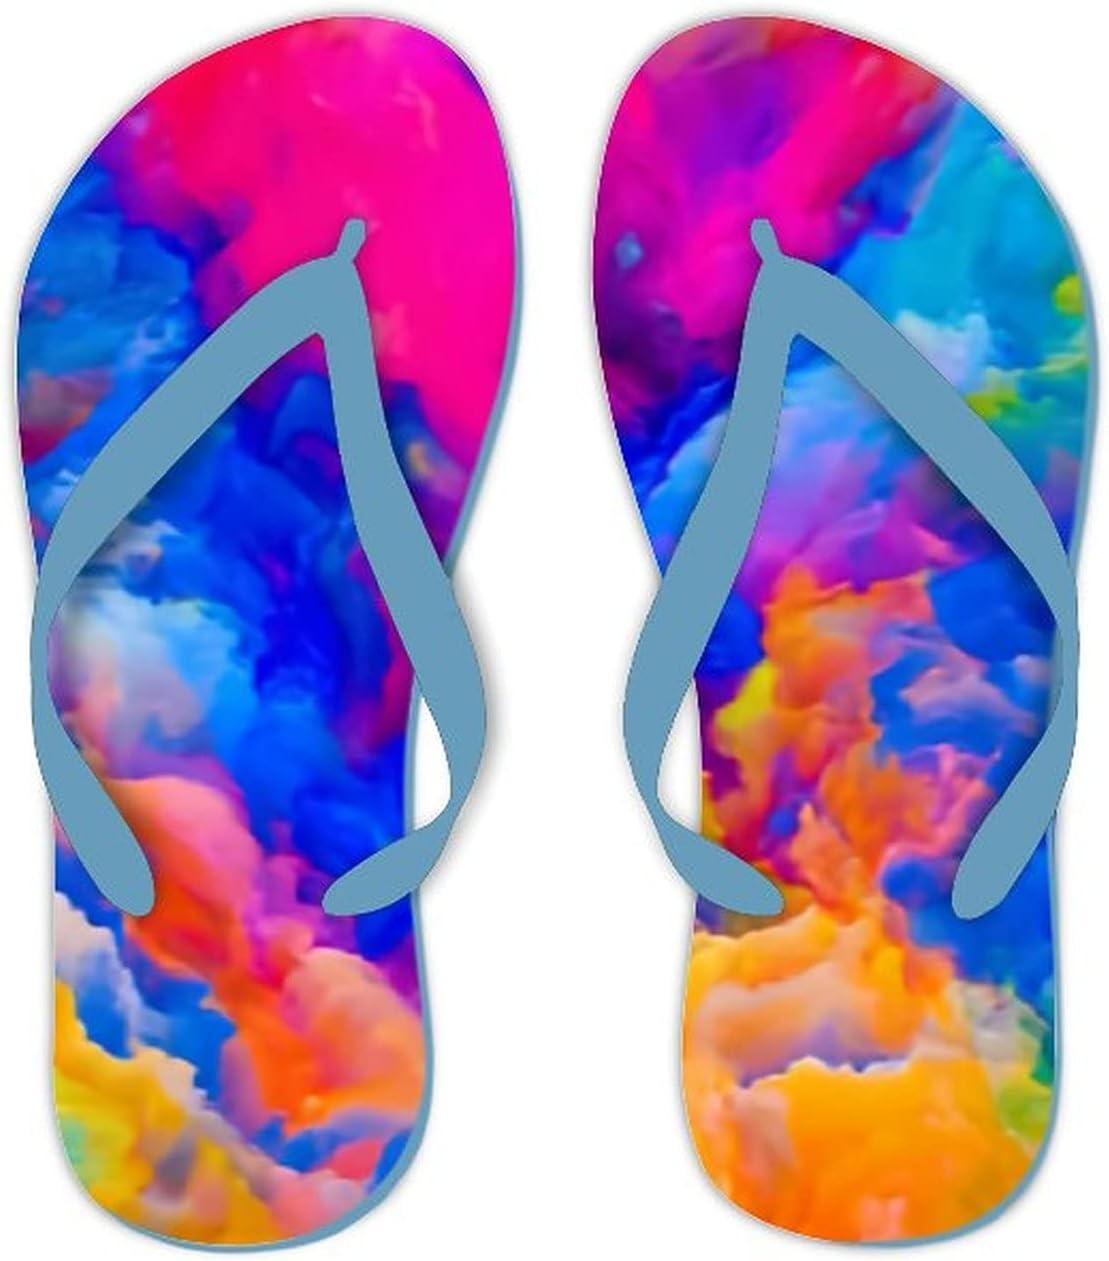 UTF4C Summer Flip Flops for Men Women Colors Imagination Series Backdrop Colorful Soft Lightweight Non Slip Sandals for Shower Beach Pool Bathroom Flat 10.5